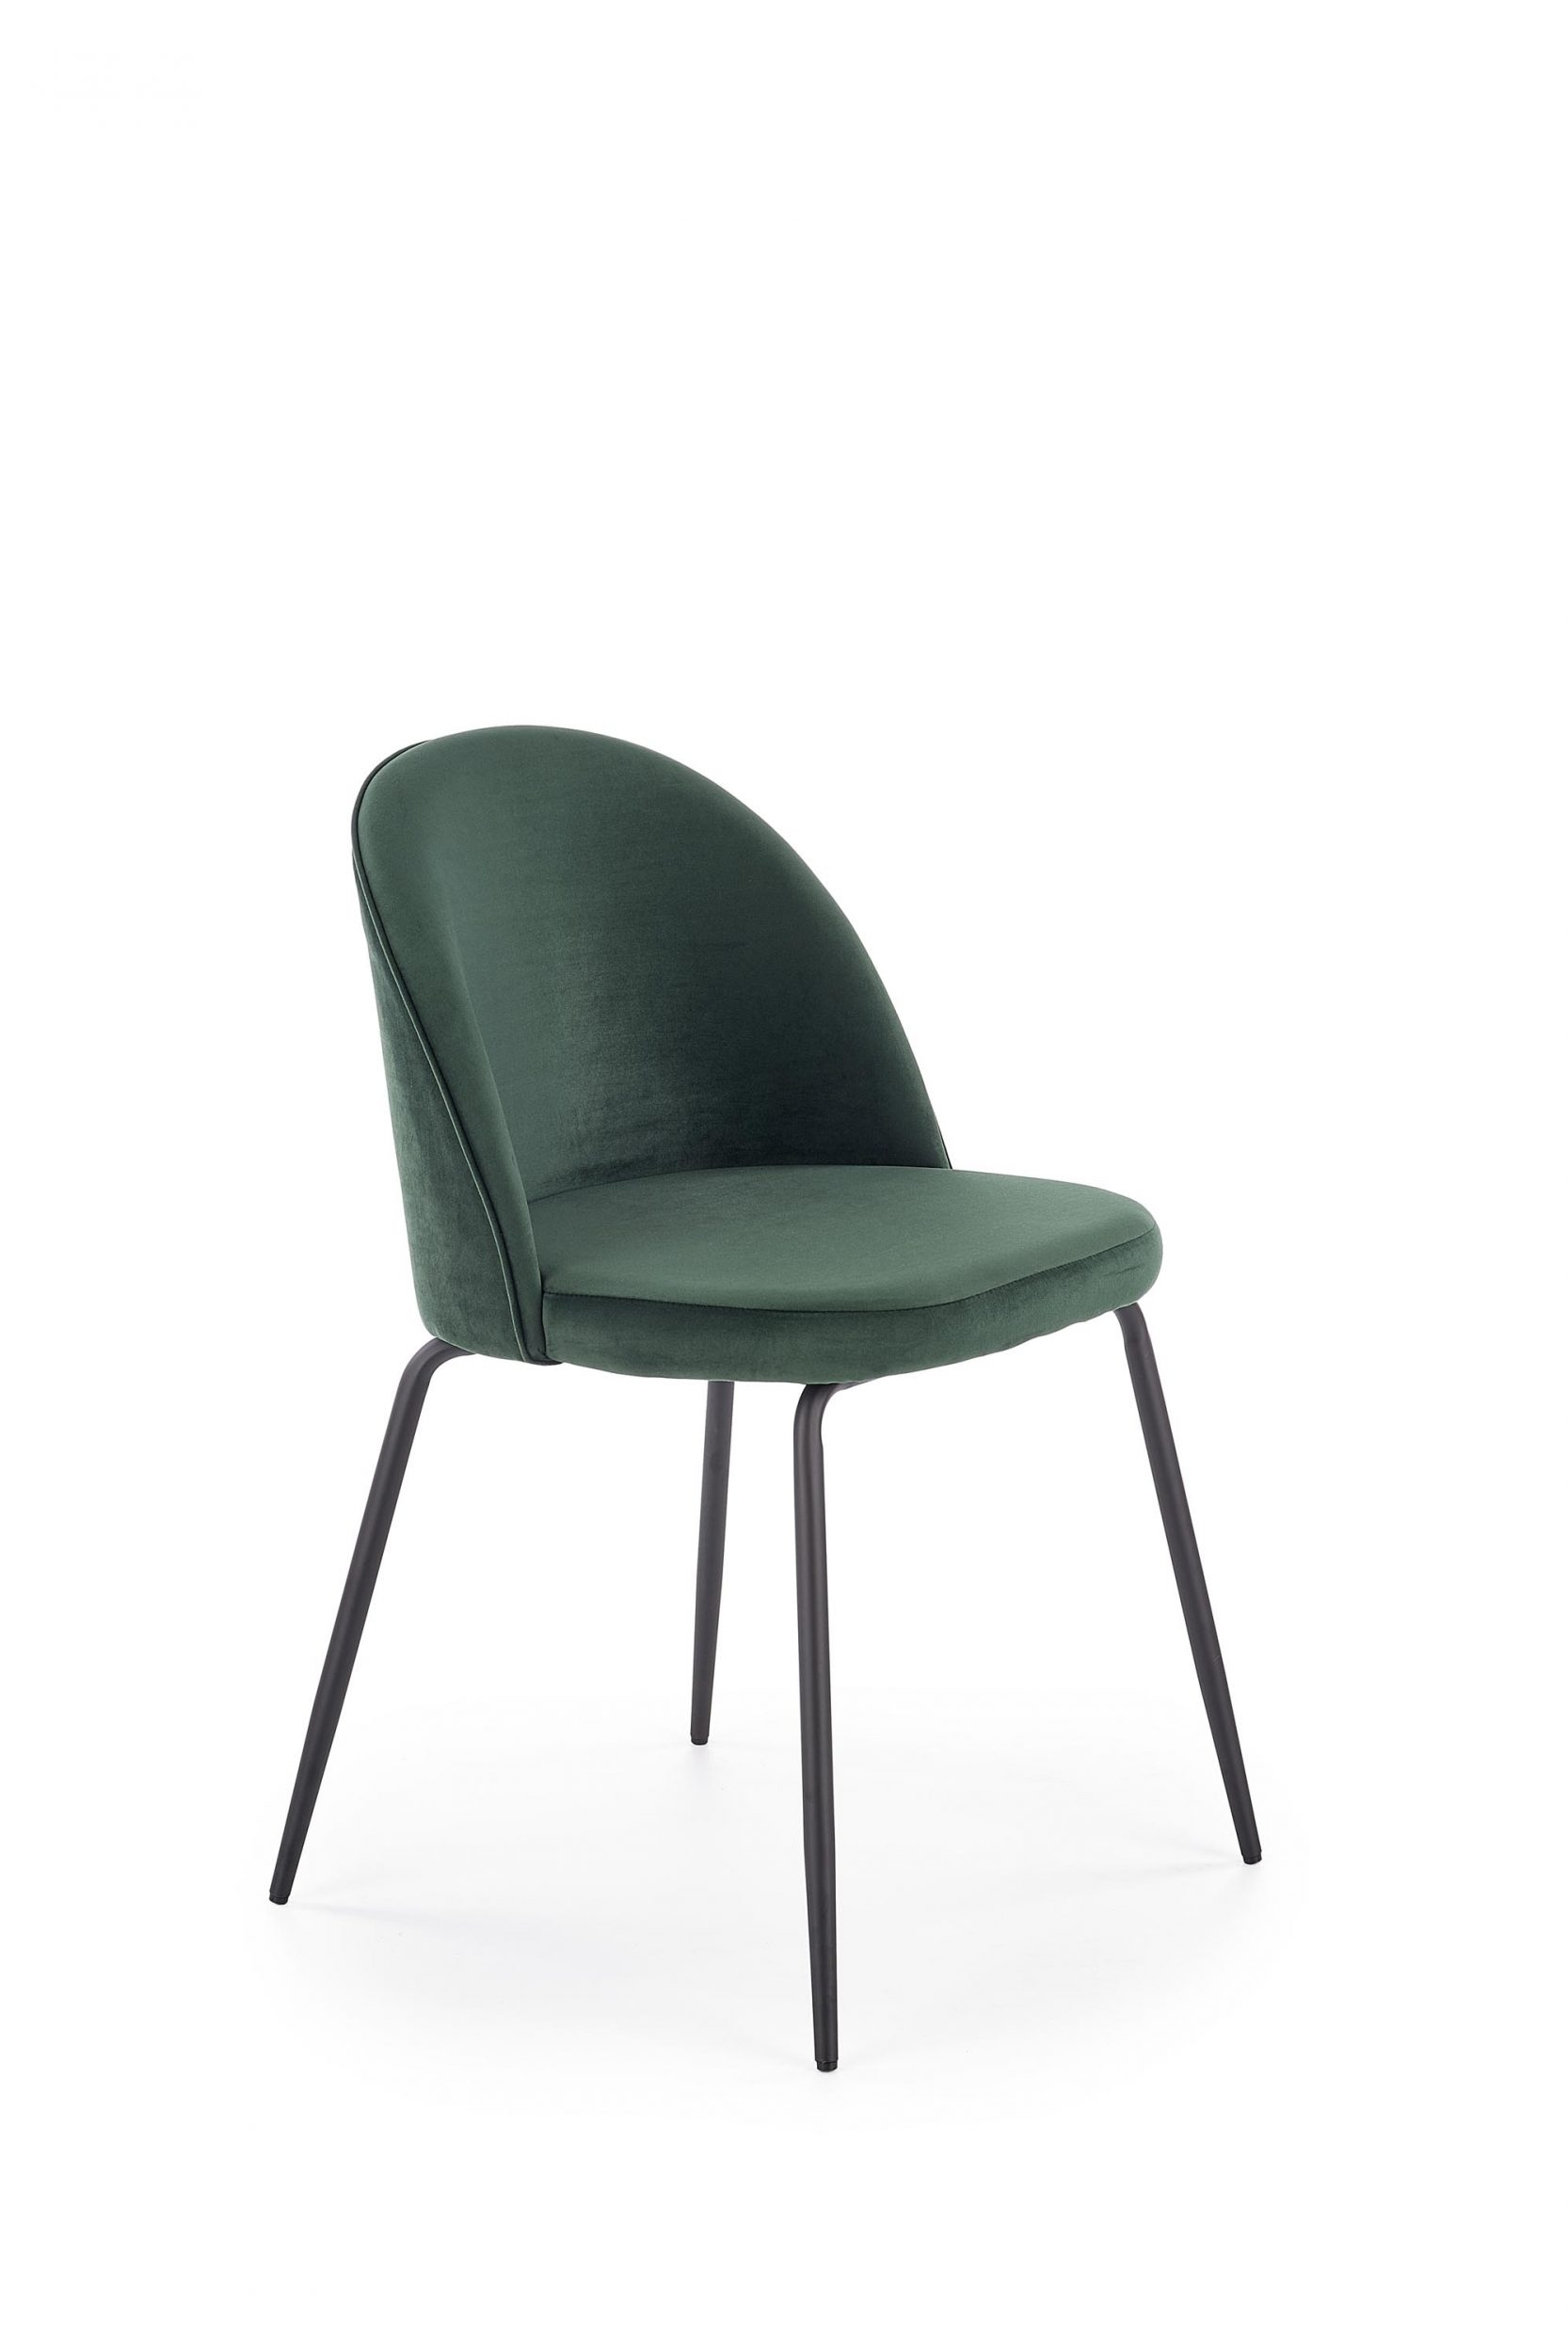 Scaun Tapitat Cu Stofa, Cu Picioare Metalice K314 Verde Inchis / Negru, L49xa50xh80 Cm